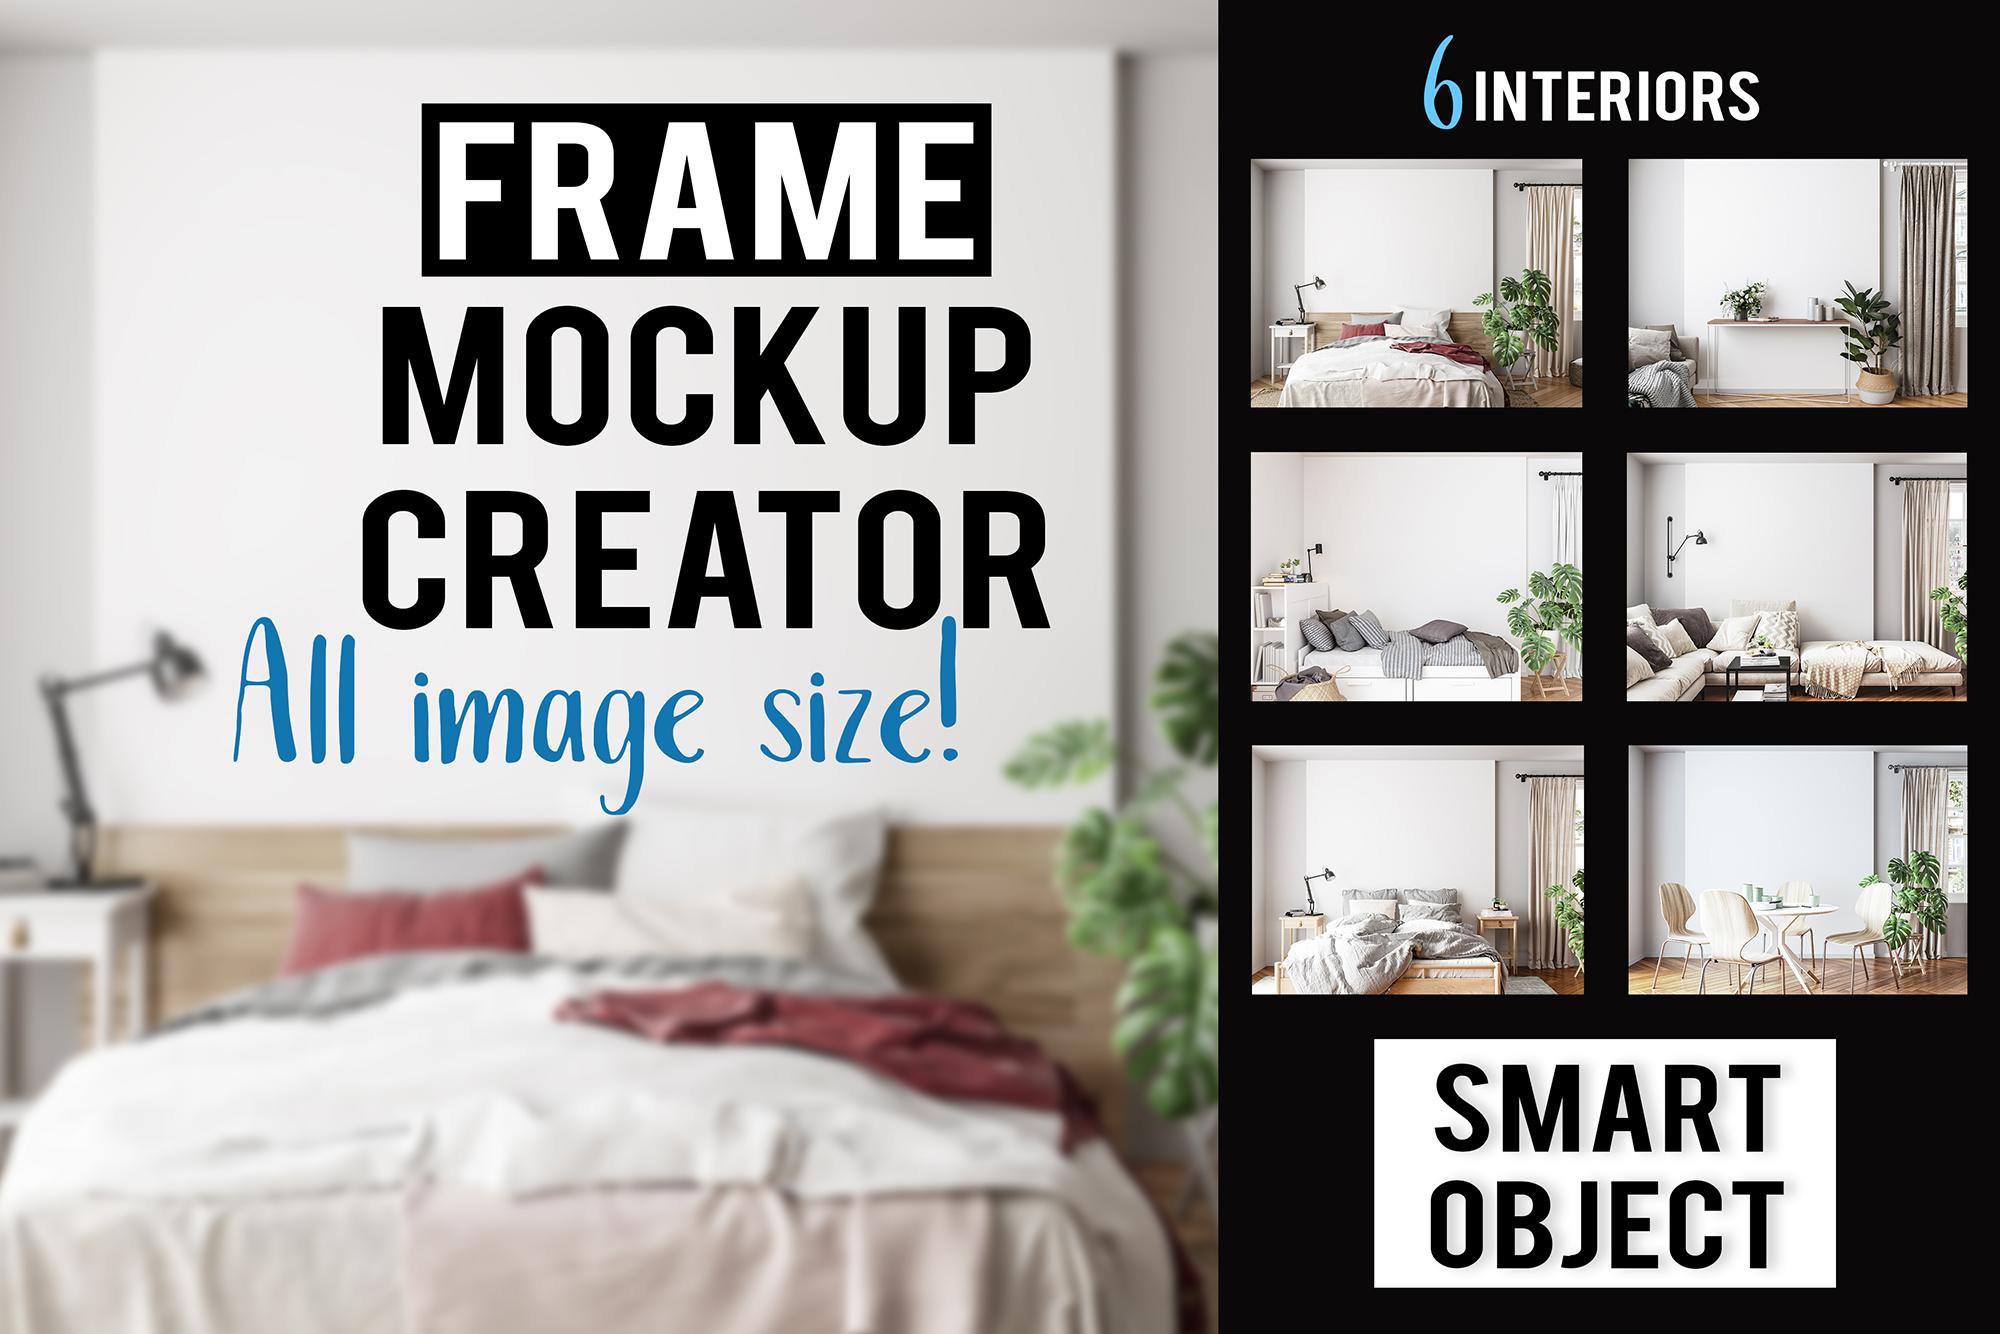 Interior mockup BUNDLE - frame & wall mockup creator example image 1